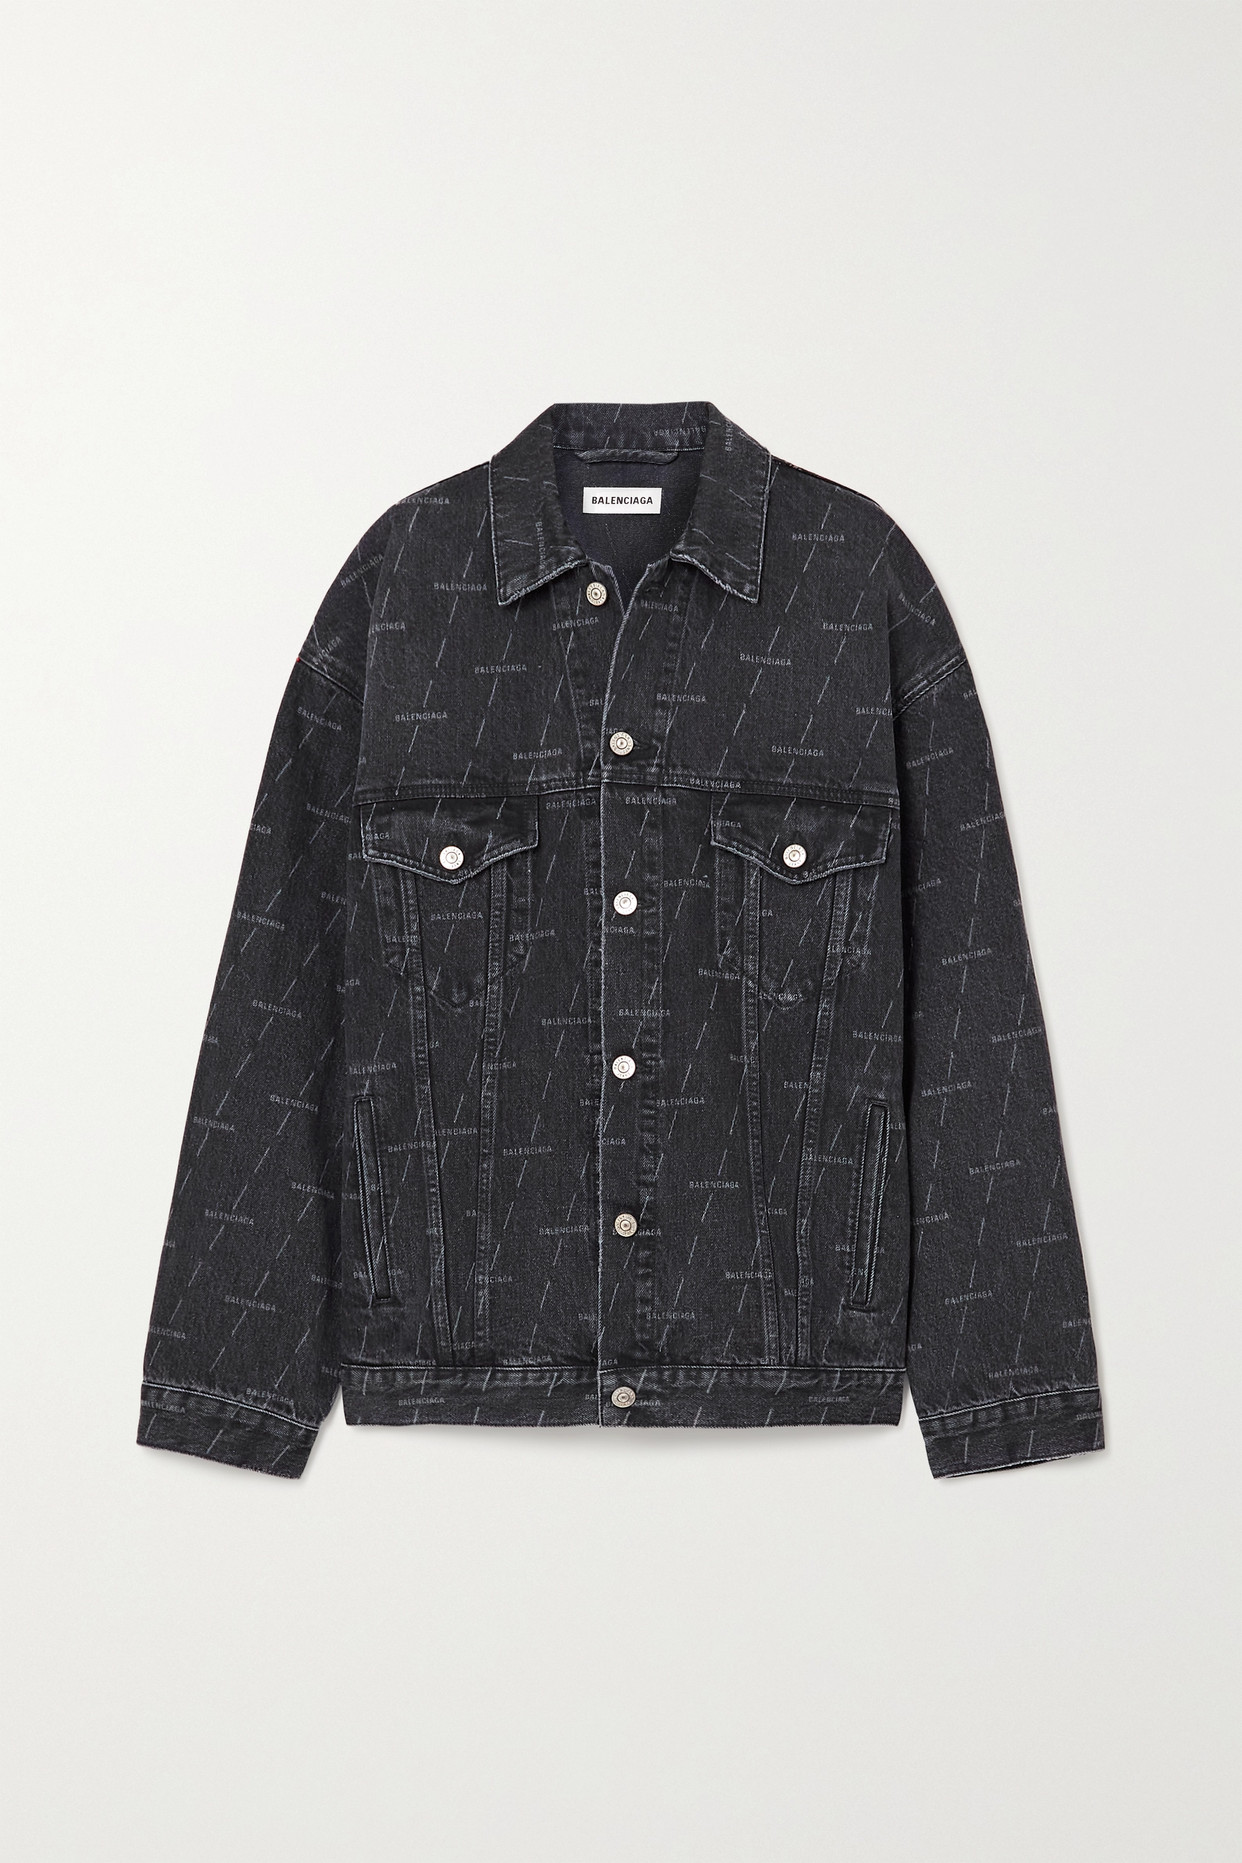 BALENCIAGA - Oversized Printed Denim Jacket - Black - FR36